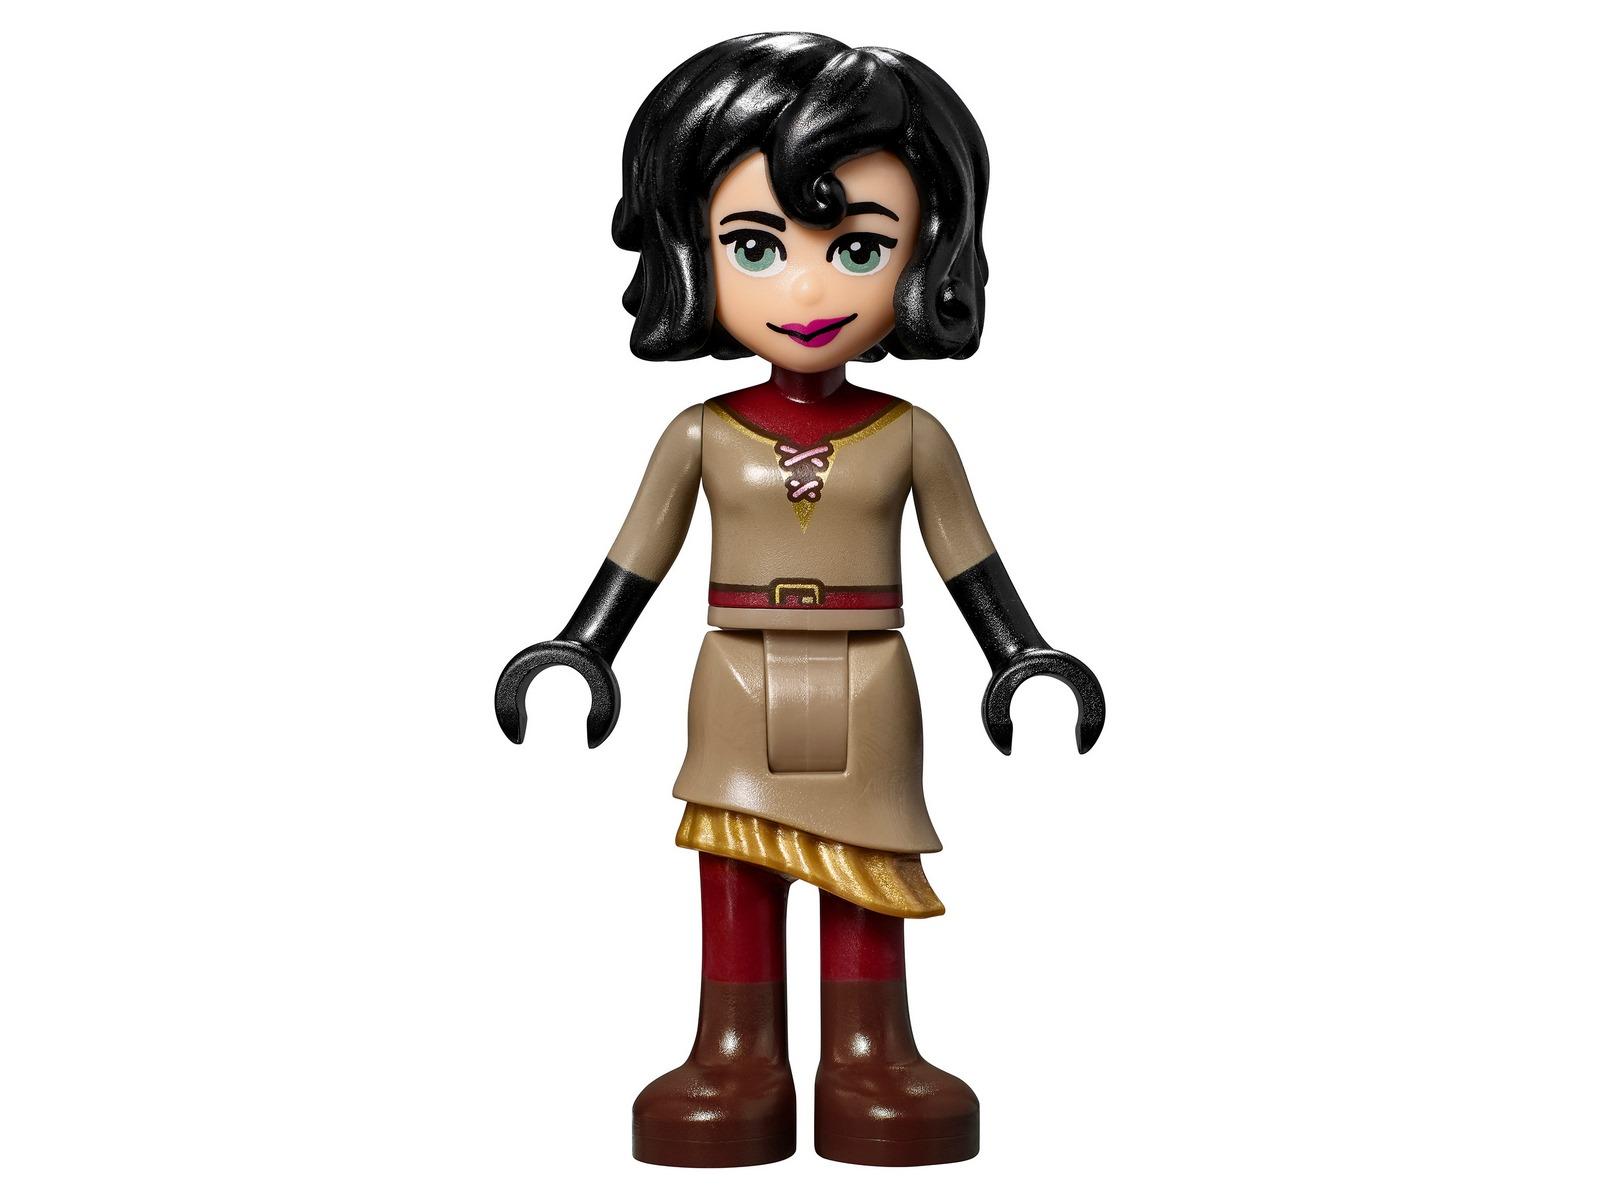 Конструктор Bl «Экипаж Рапунцель» 11057 (Disney Princess 41157) / 329 деталей